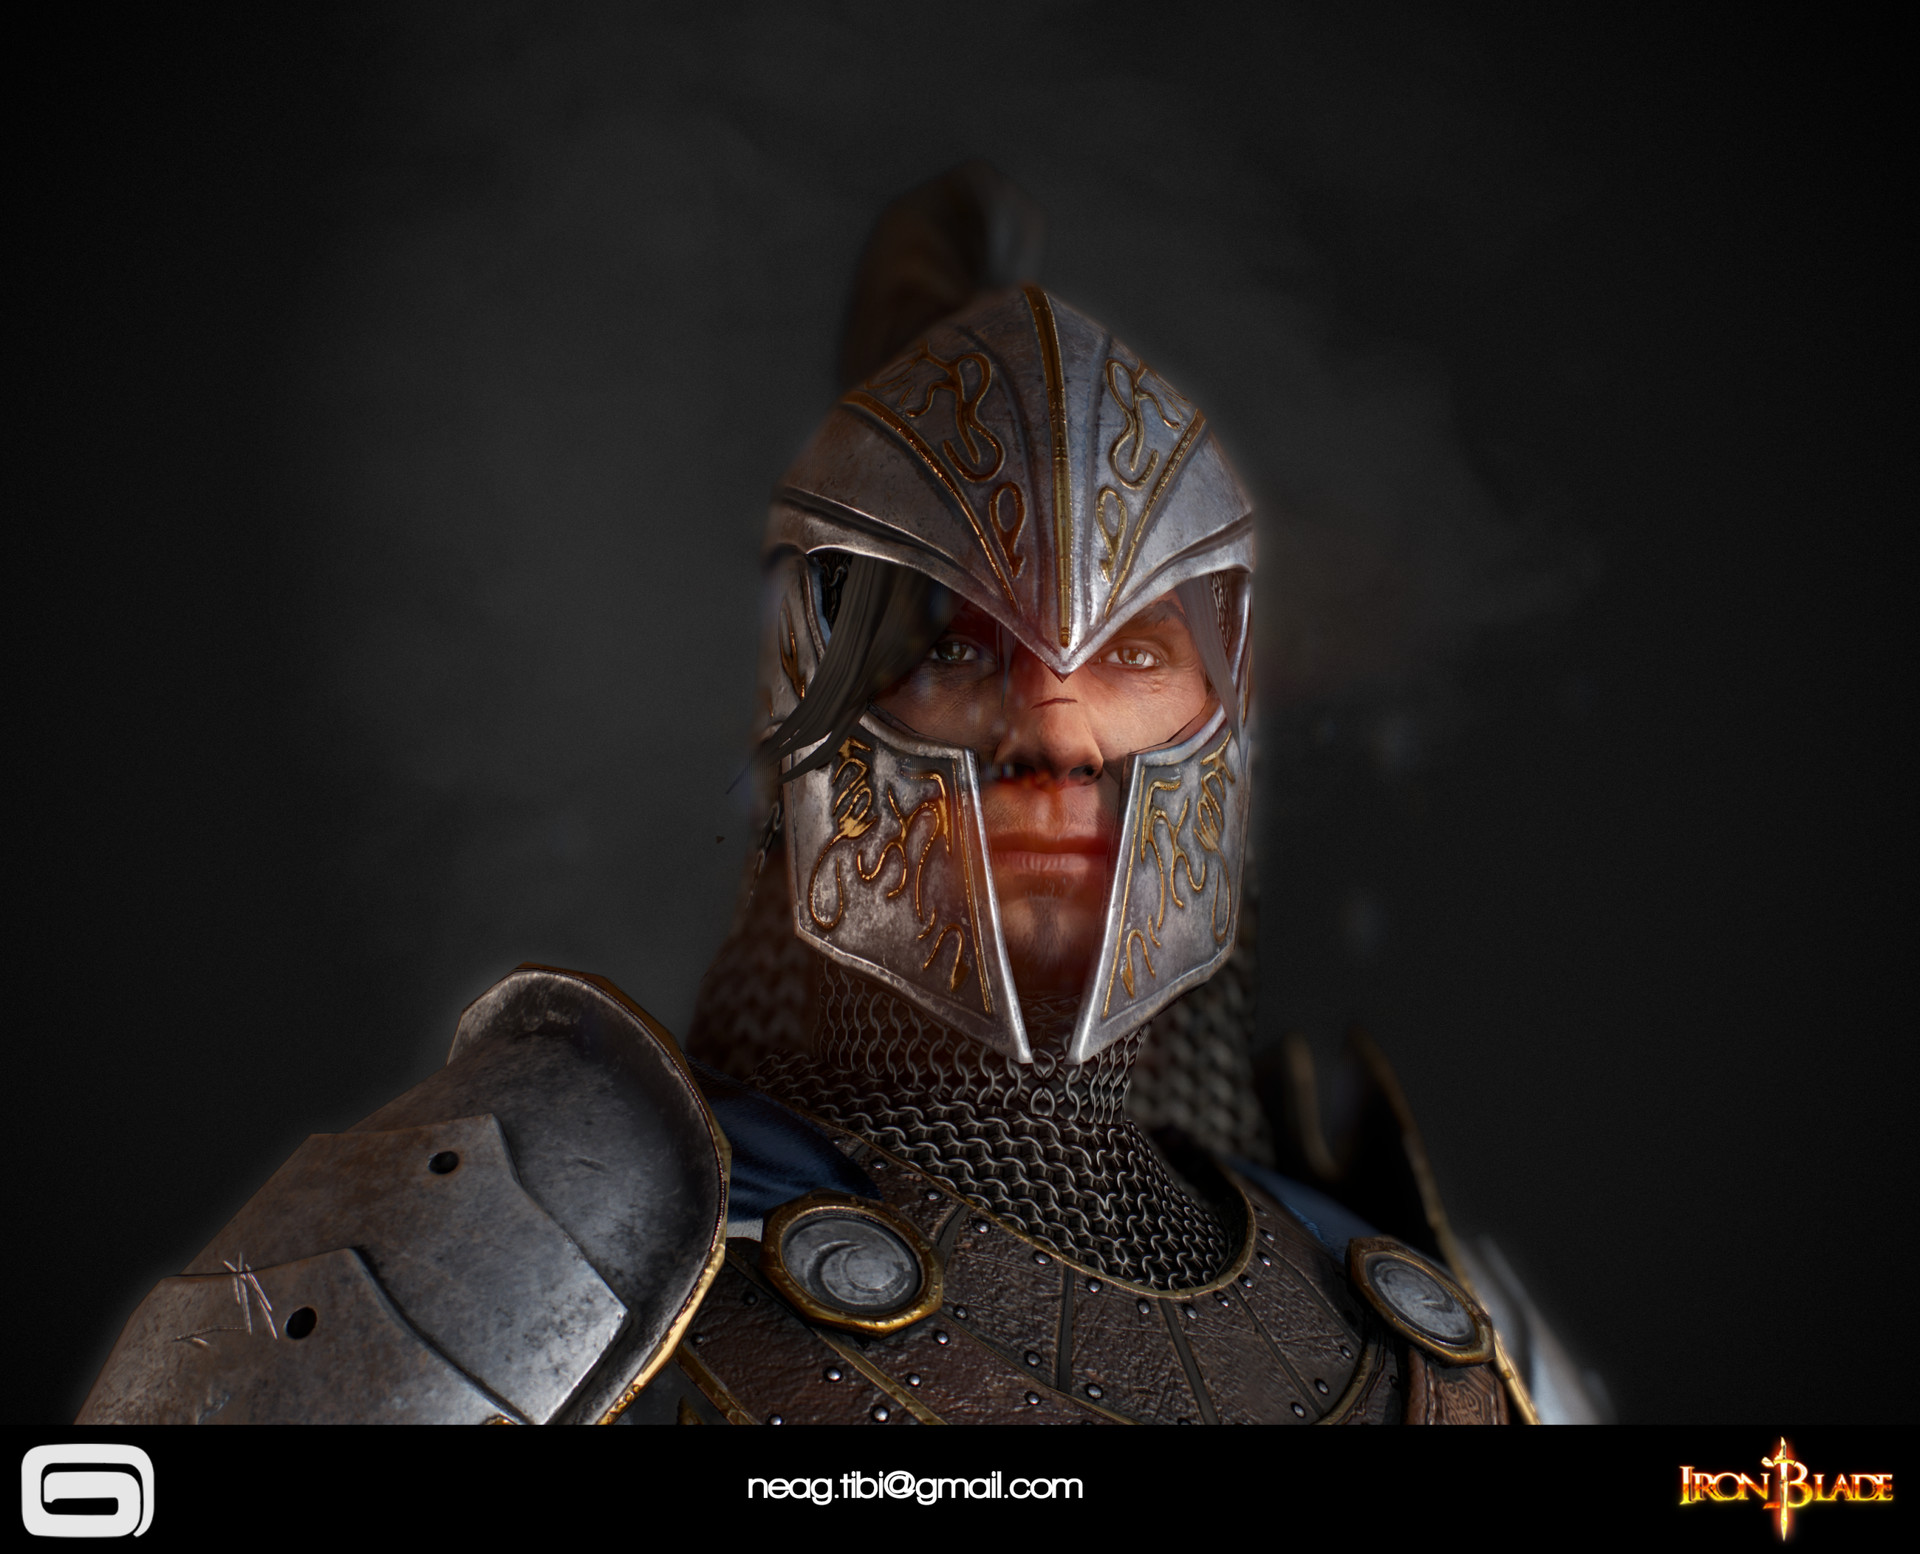 Tibi neag tibi neag iron blade mc armor 09c low poly 04 resize